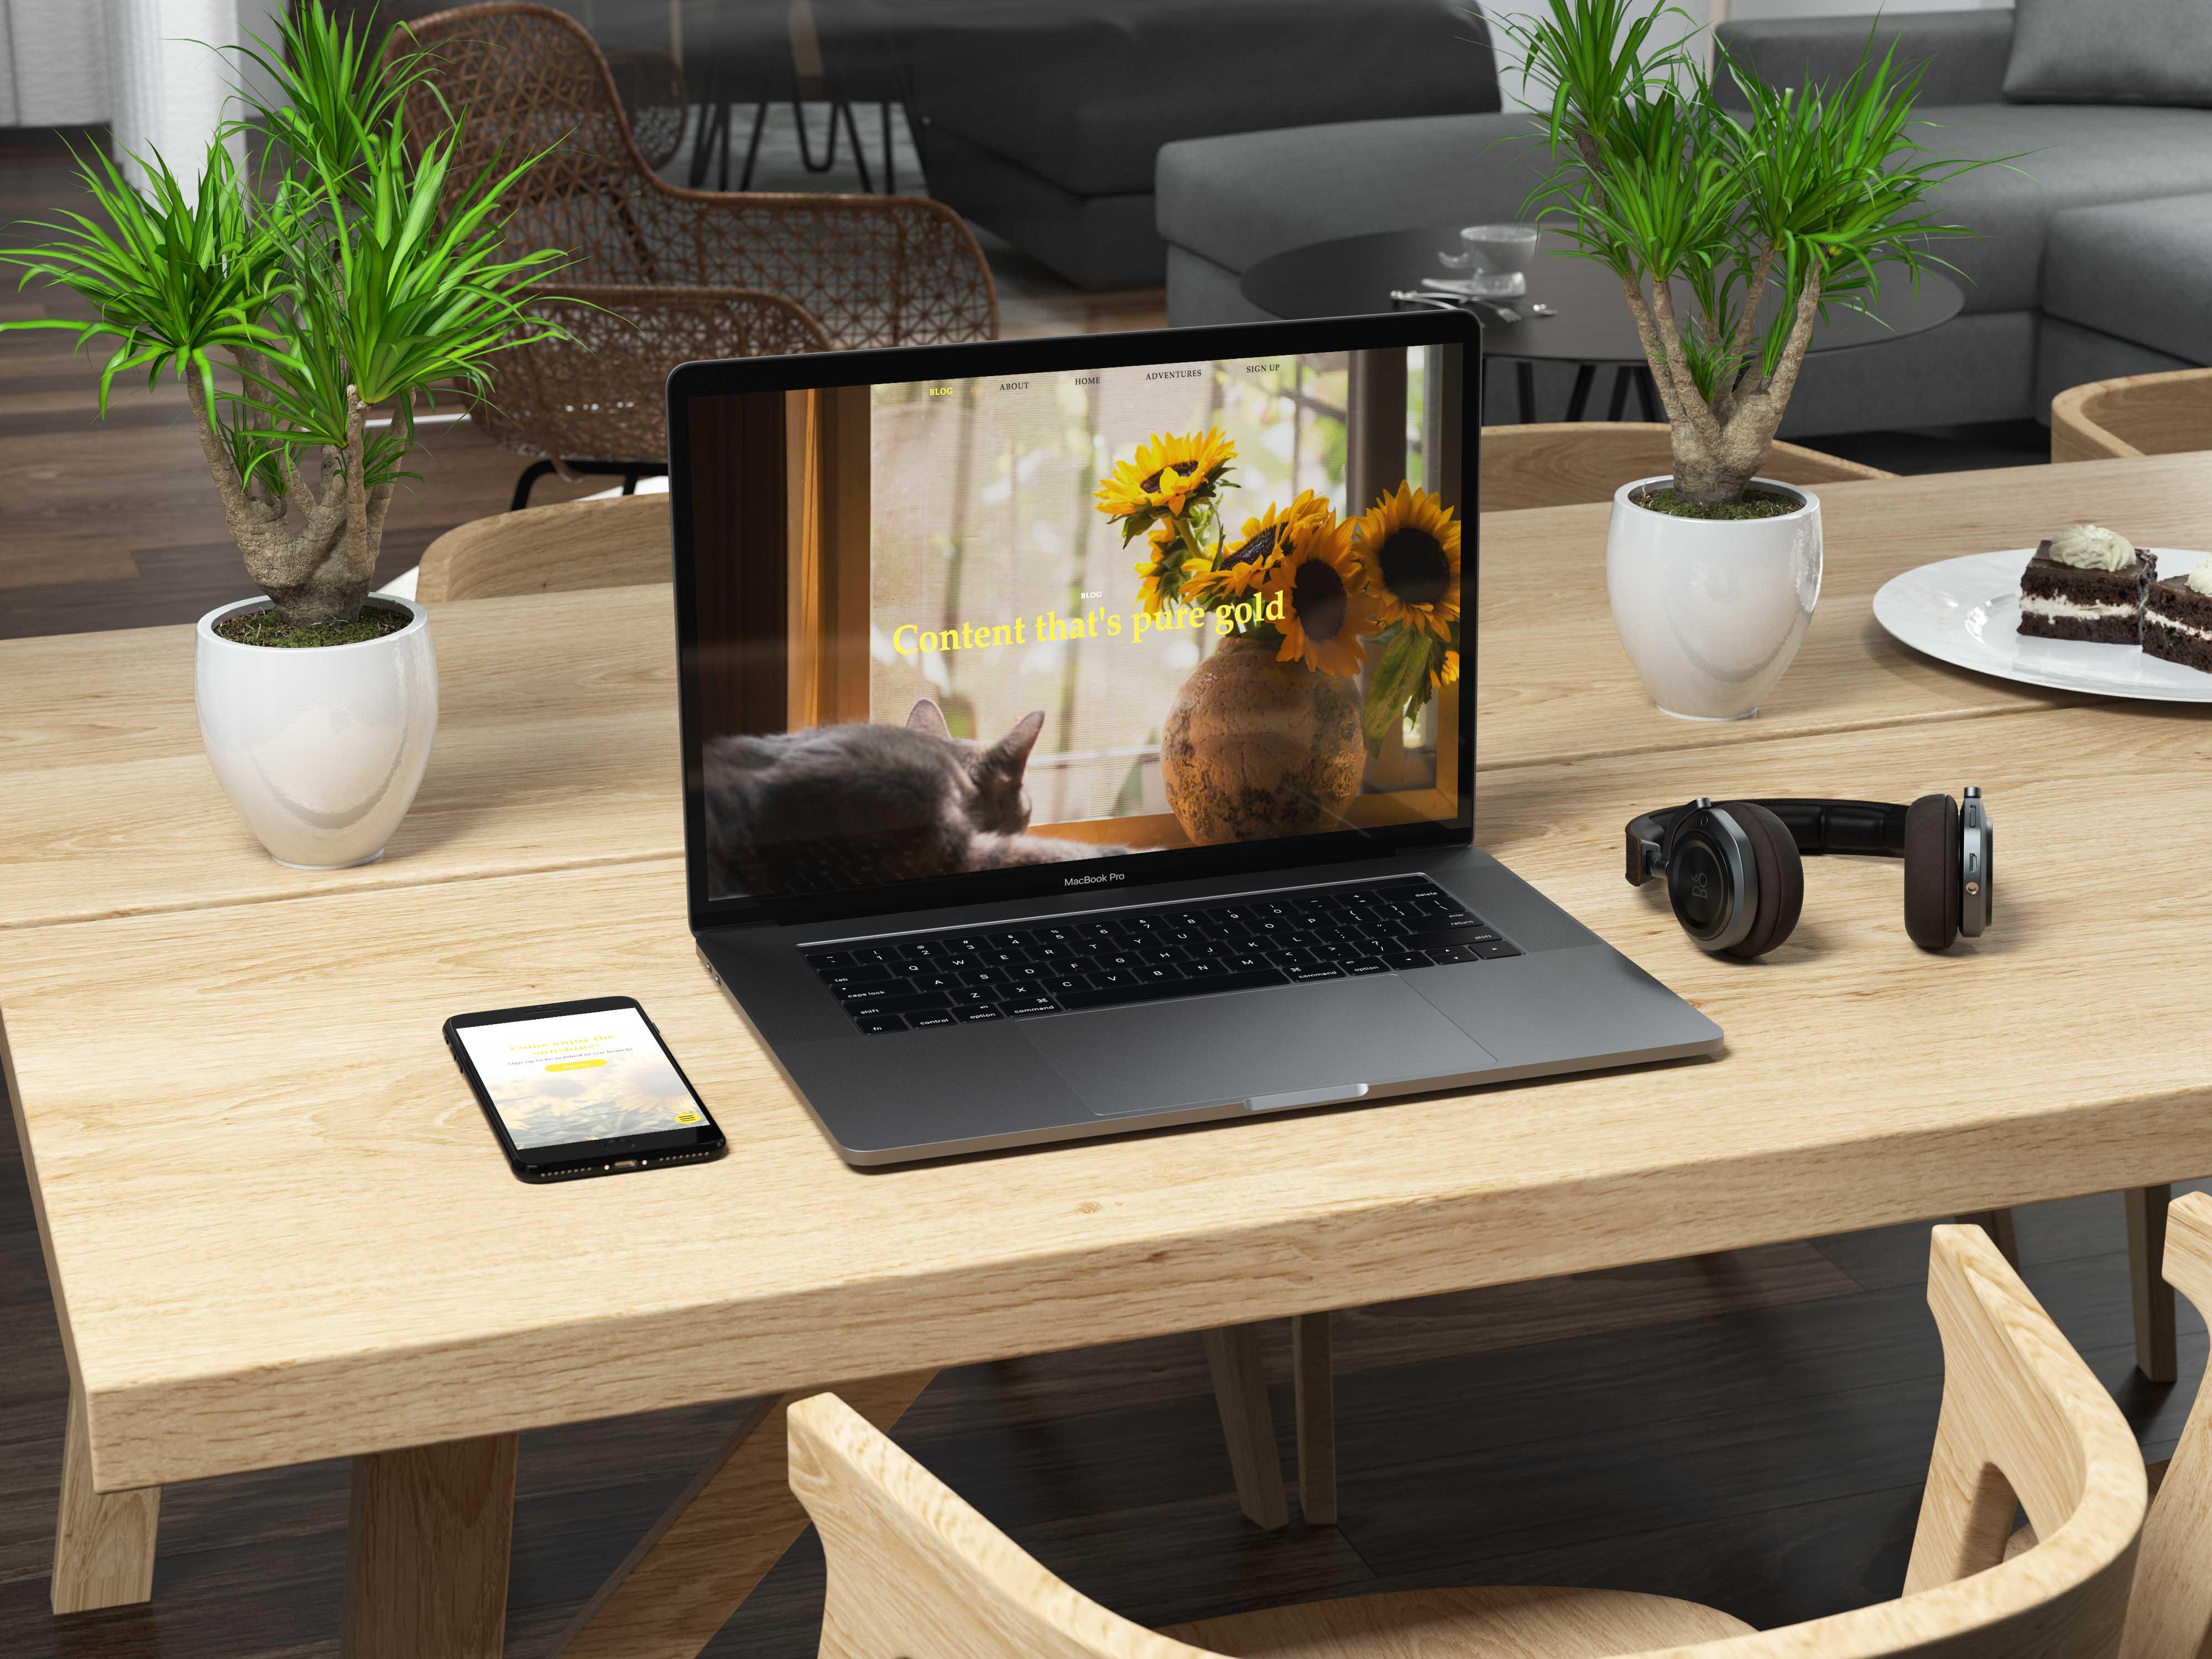 Fields of Gold website on a laptop on a desk